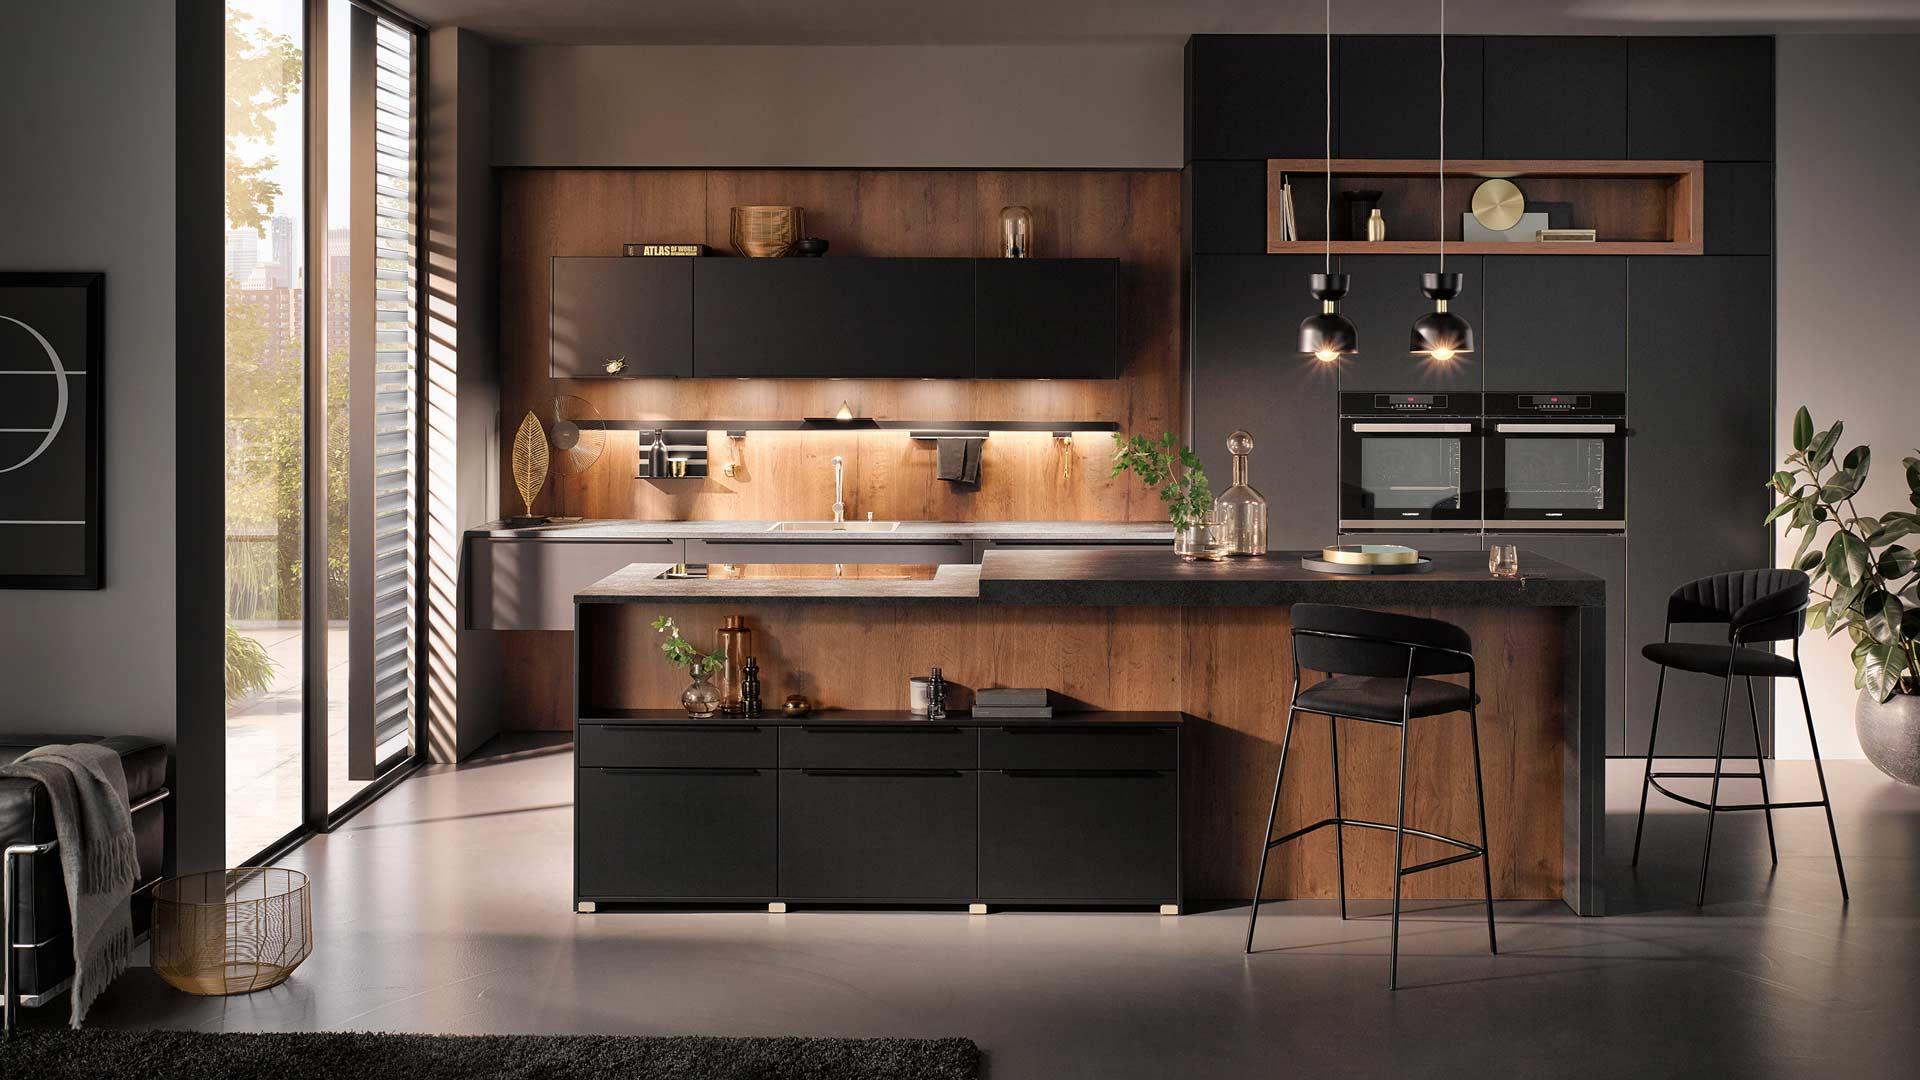 Küchentrends 2020 Häcker Mattlack im Miele Center Pellet